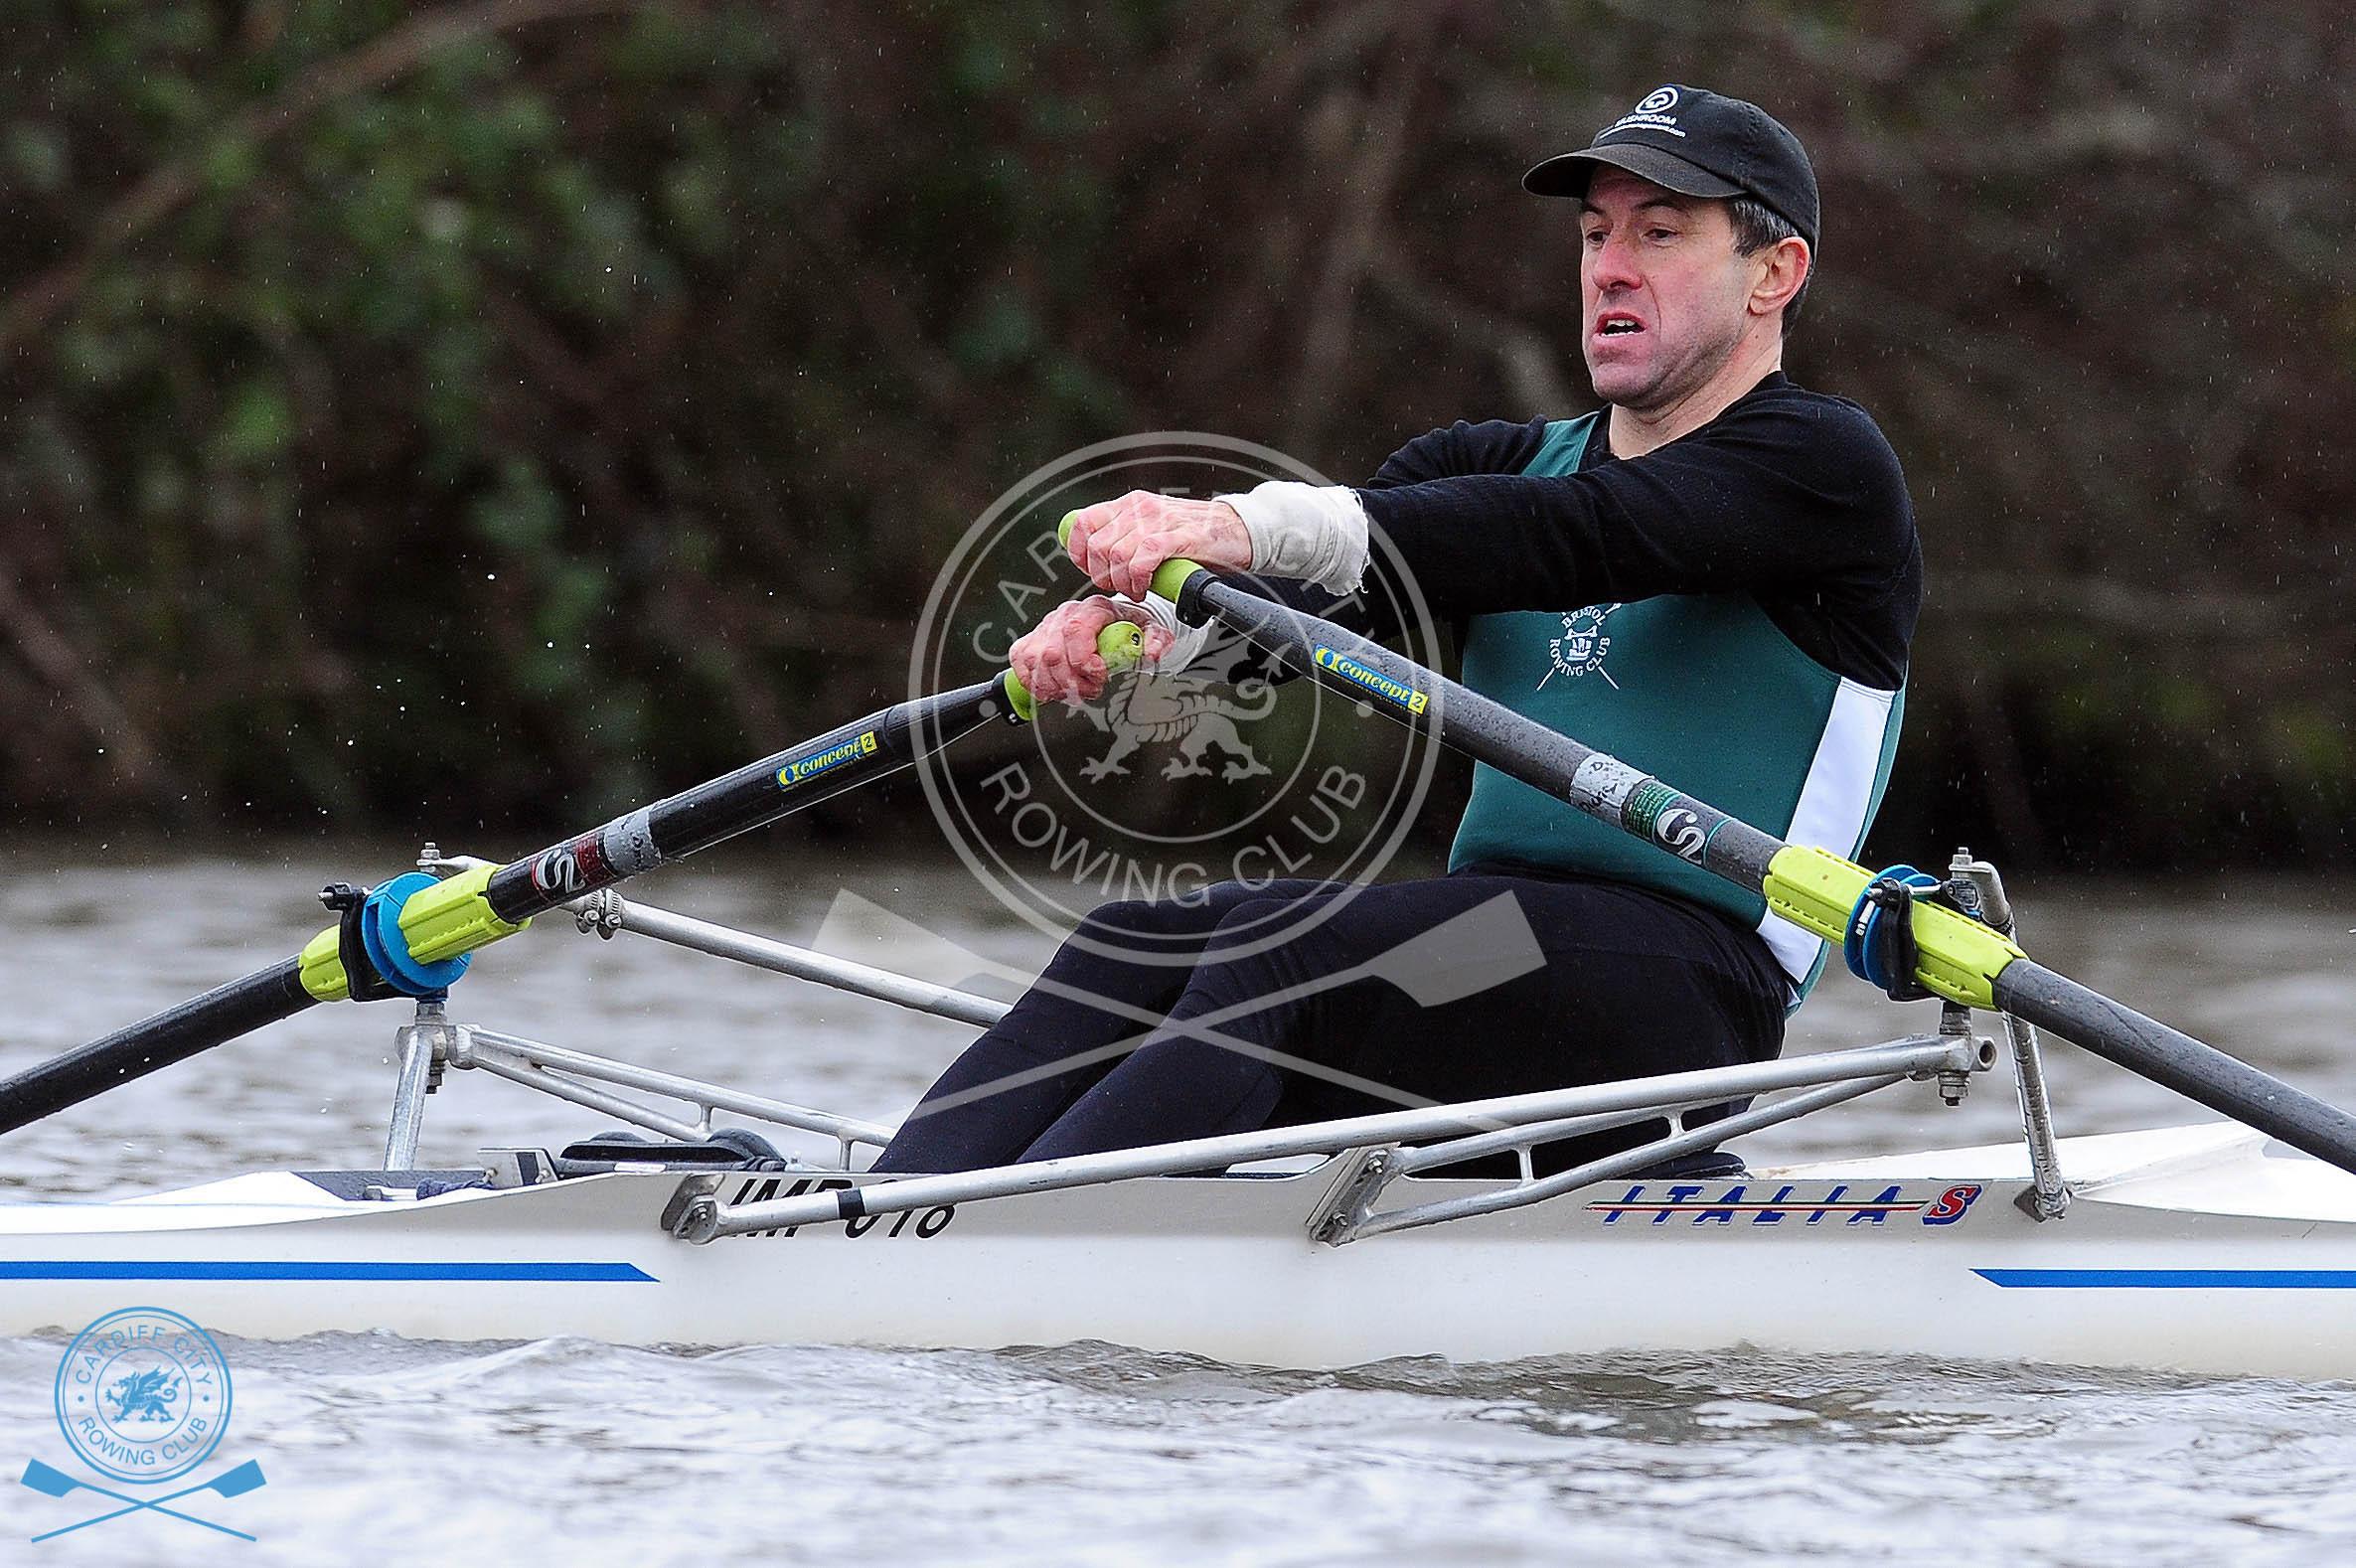 DW_280119_Cardiff_City_Rowing_291.jpg